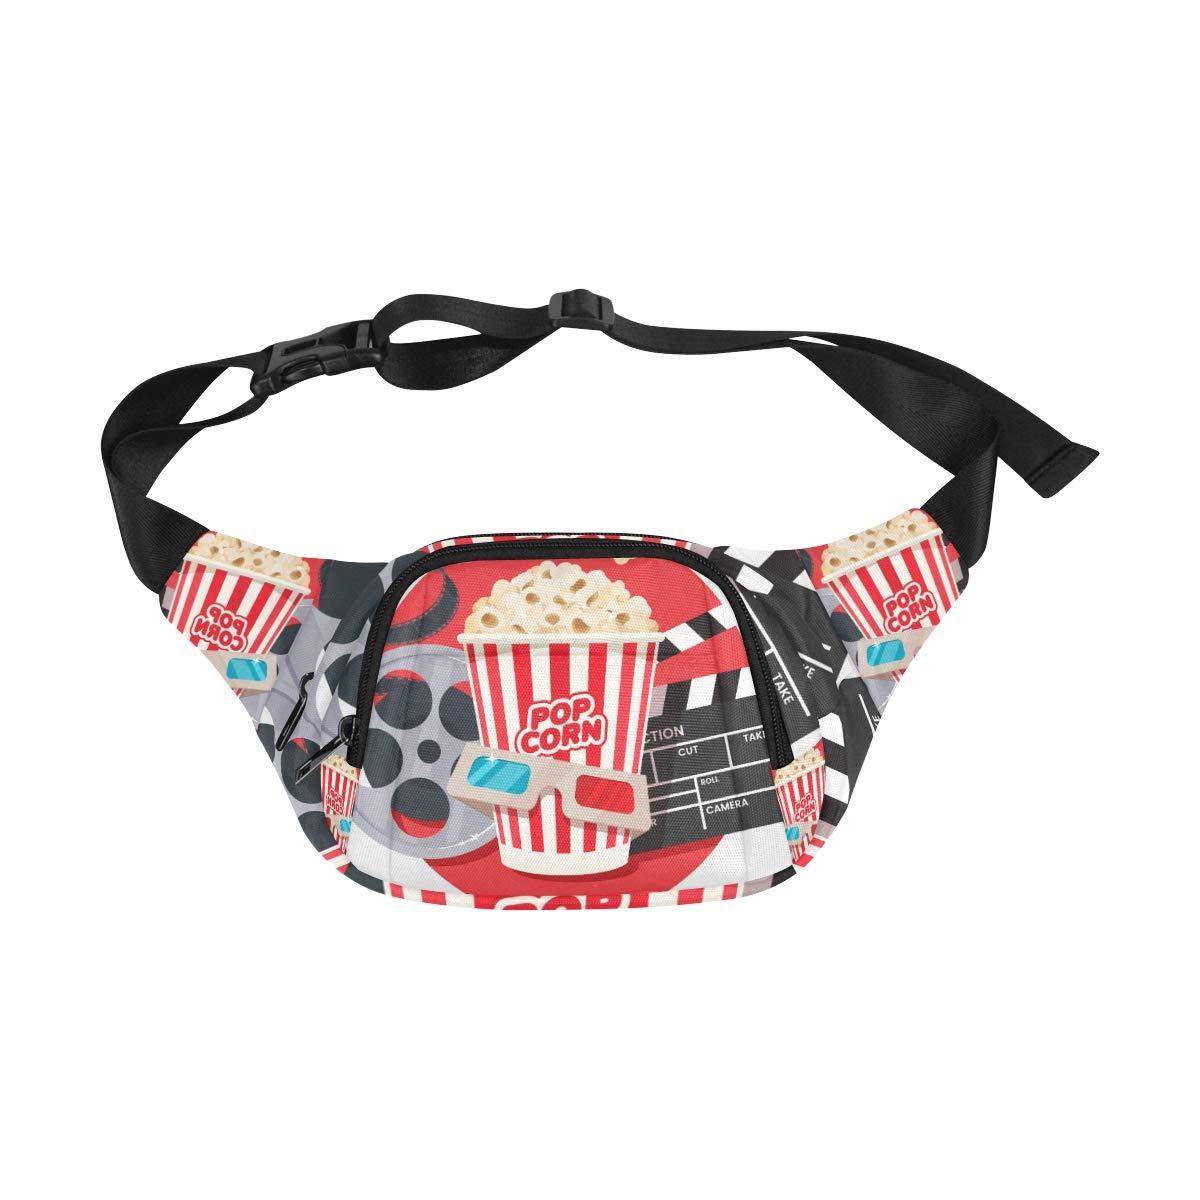 Movie Clapper And Film Reel Cinema Fenny Packs Waist Bags Adjustable Belt Waterproof Nylon Travel Running Sport Vacation Party For Men Women Boys Girls Kids